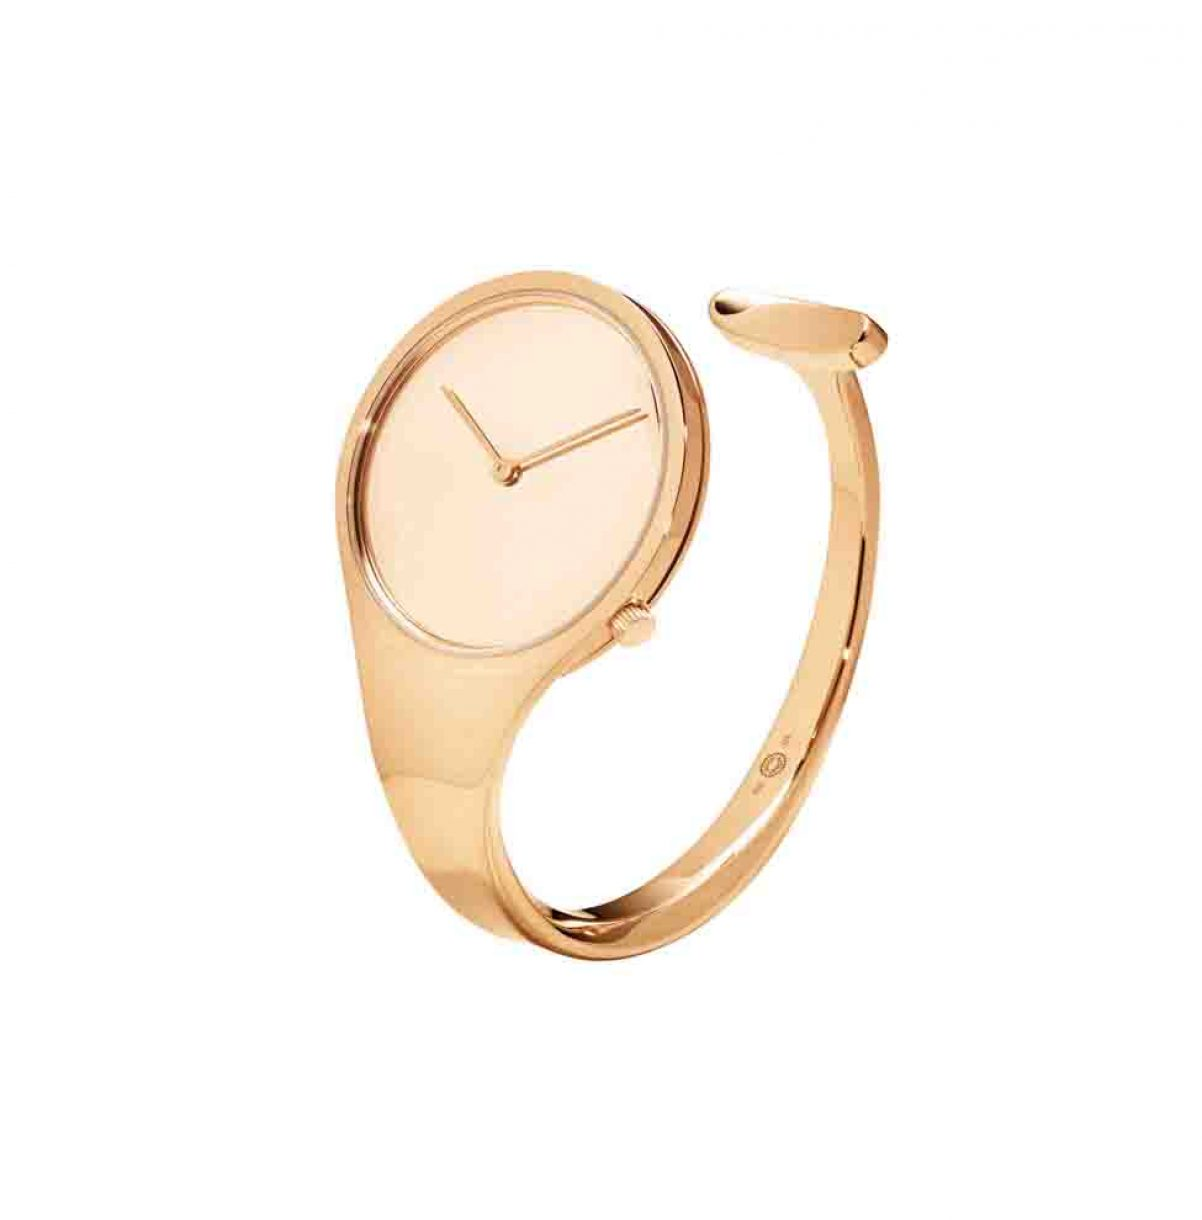 GEORG JENSEN VIVIANNA 18K玫瑰金手鐲錶,參考售價 NTD504,600起。